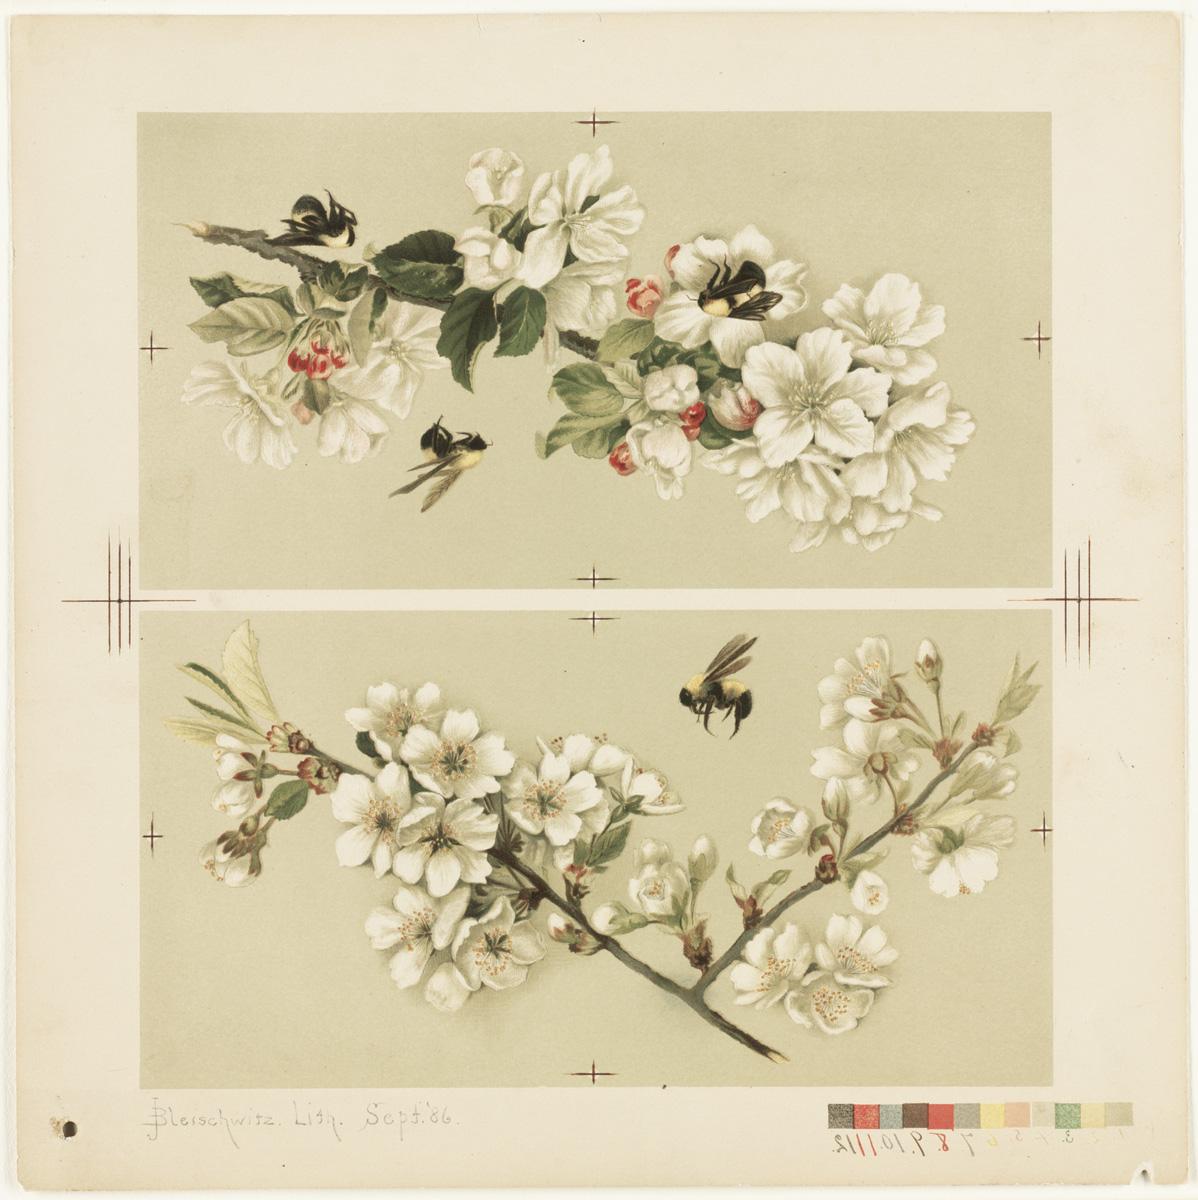 Drawn sakura blossom apple blossom And Bees File:Cherry Drawing (Boston